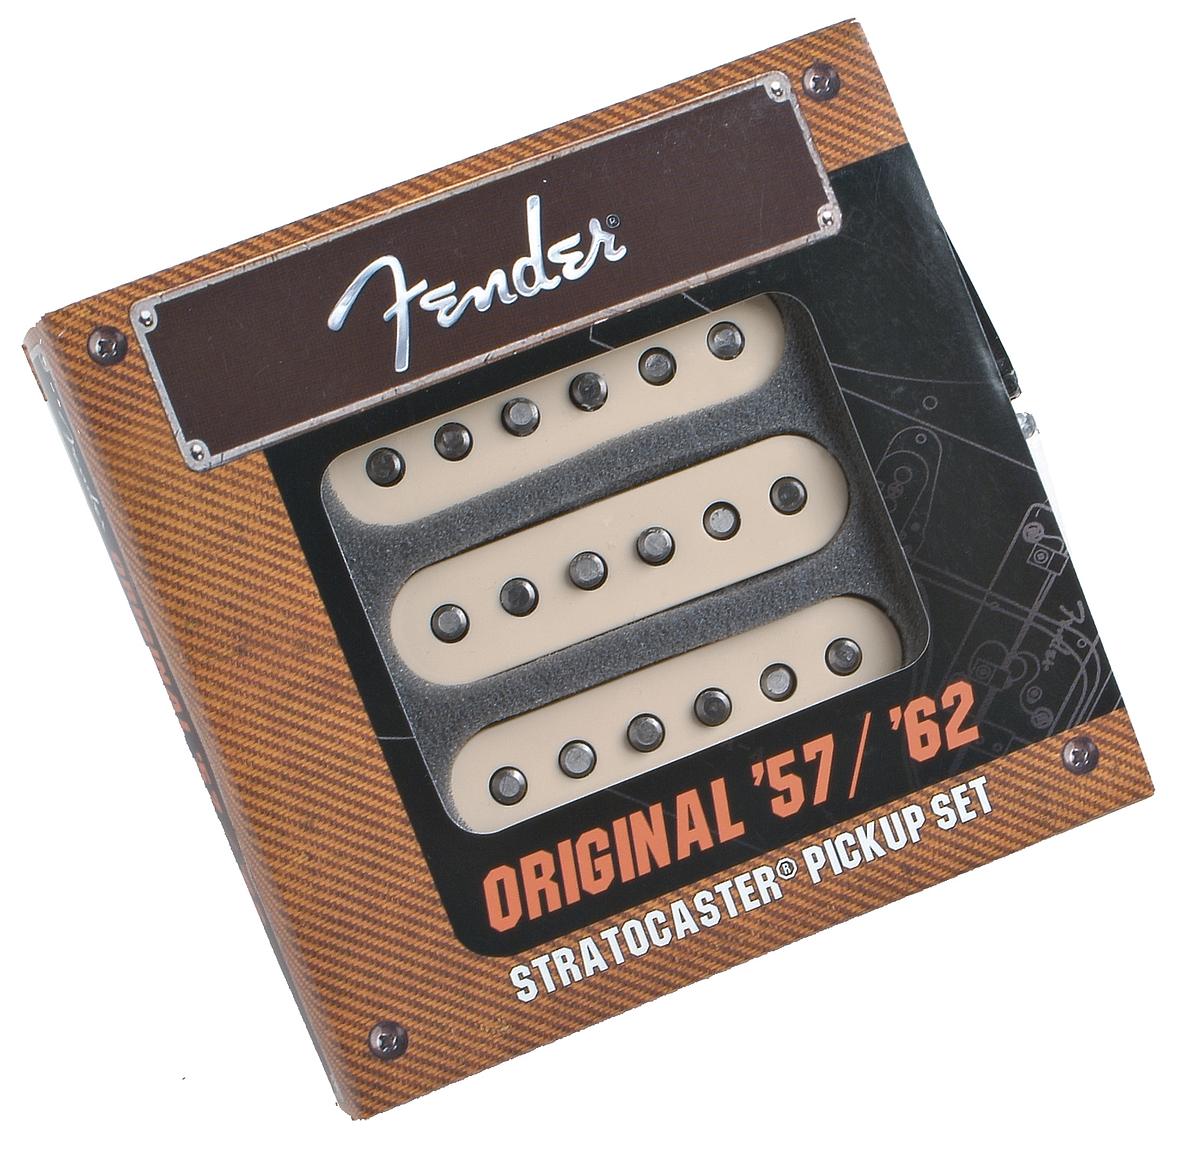 Fender® Original '57/'62 Strat Pickups - Set of 3 | 099-2117-000